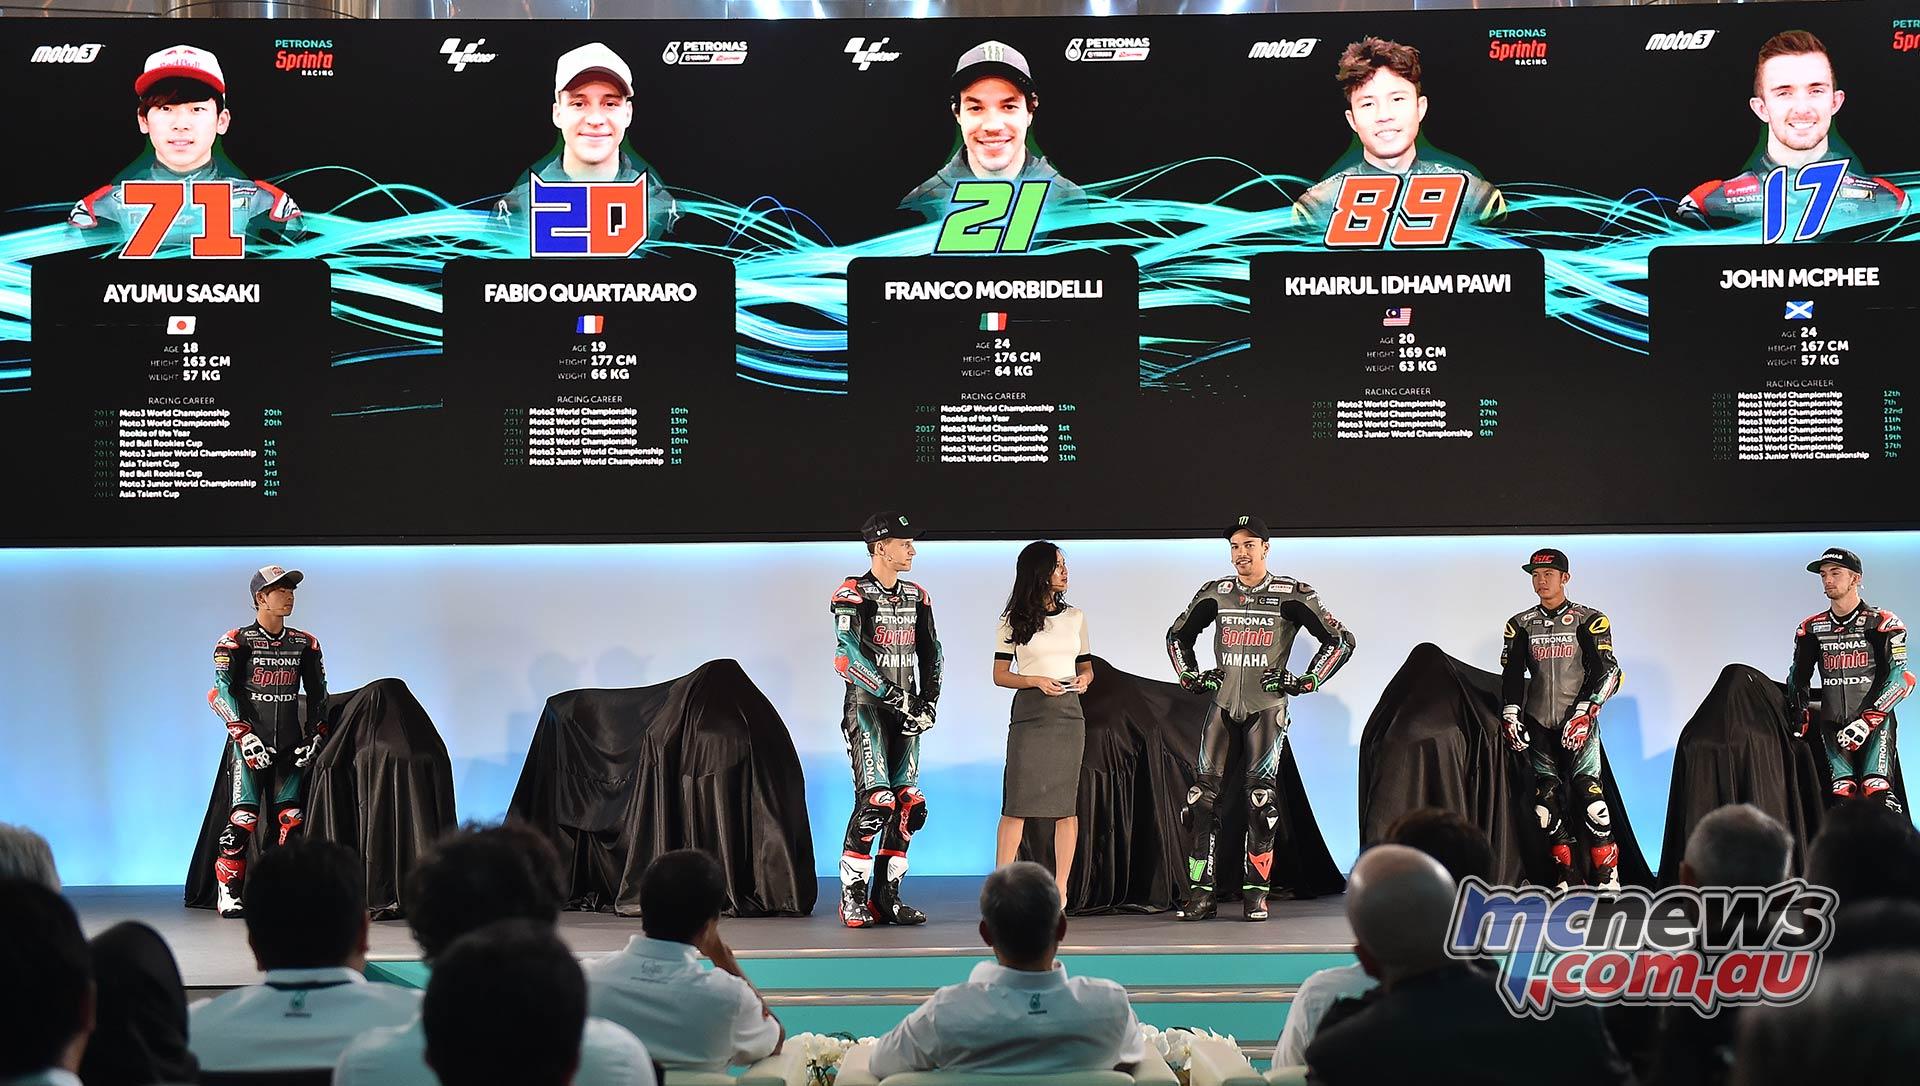 Petronas Launch Ayumu Sasaki Fabio Quartararo Morbidelli Idham Pawi McPhee